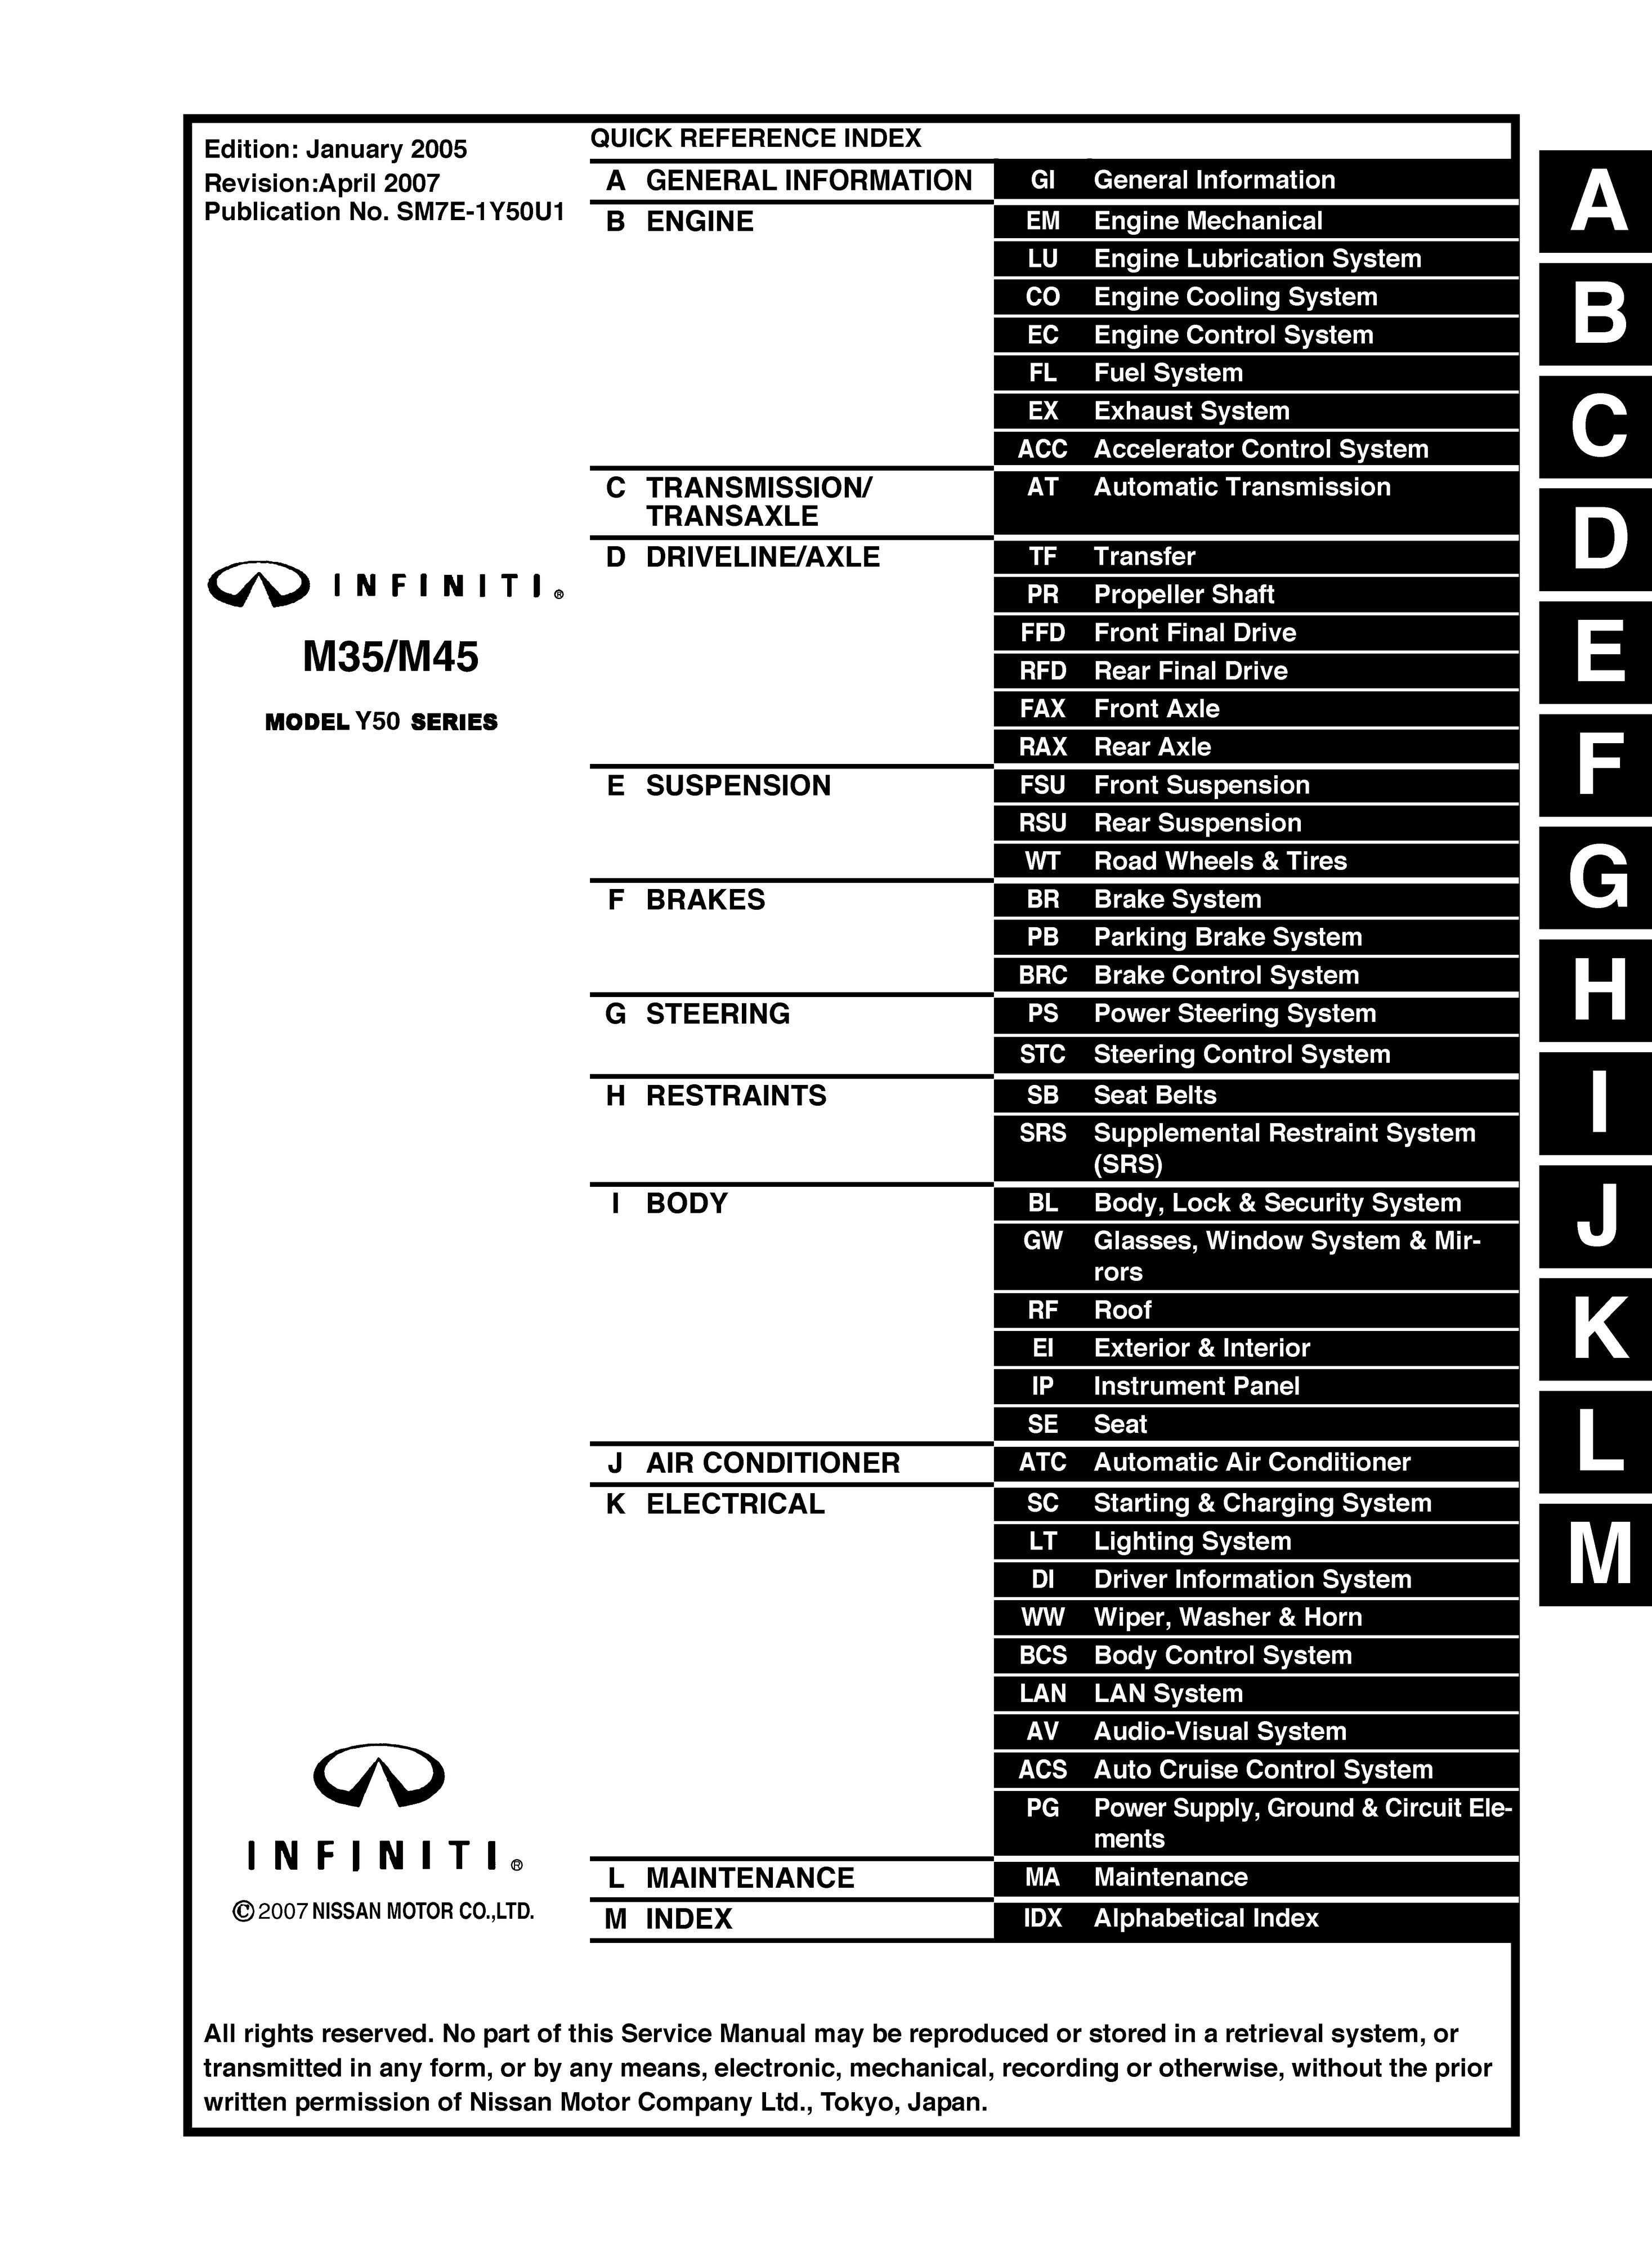 2003 2007 Infiniti M45 M35 Oem Workshop Service And R